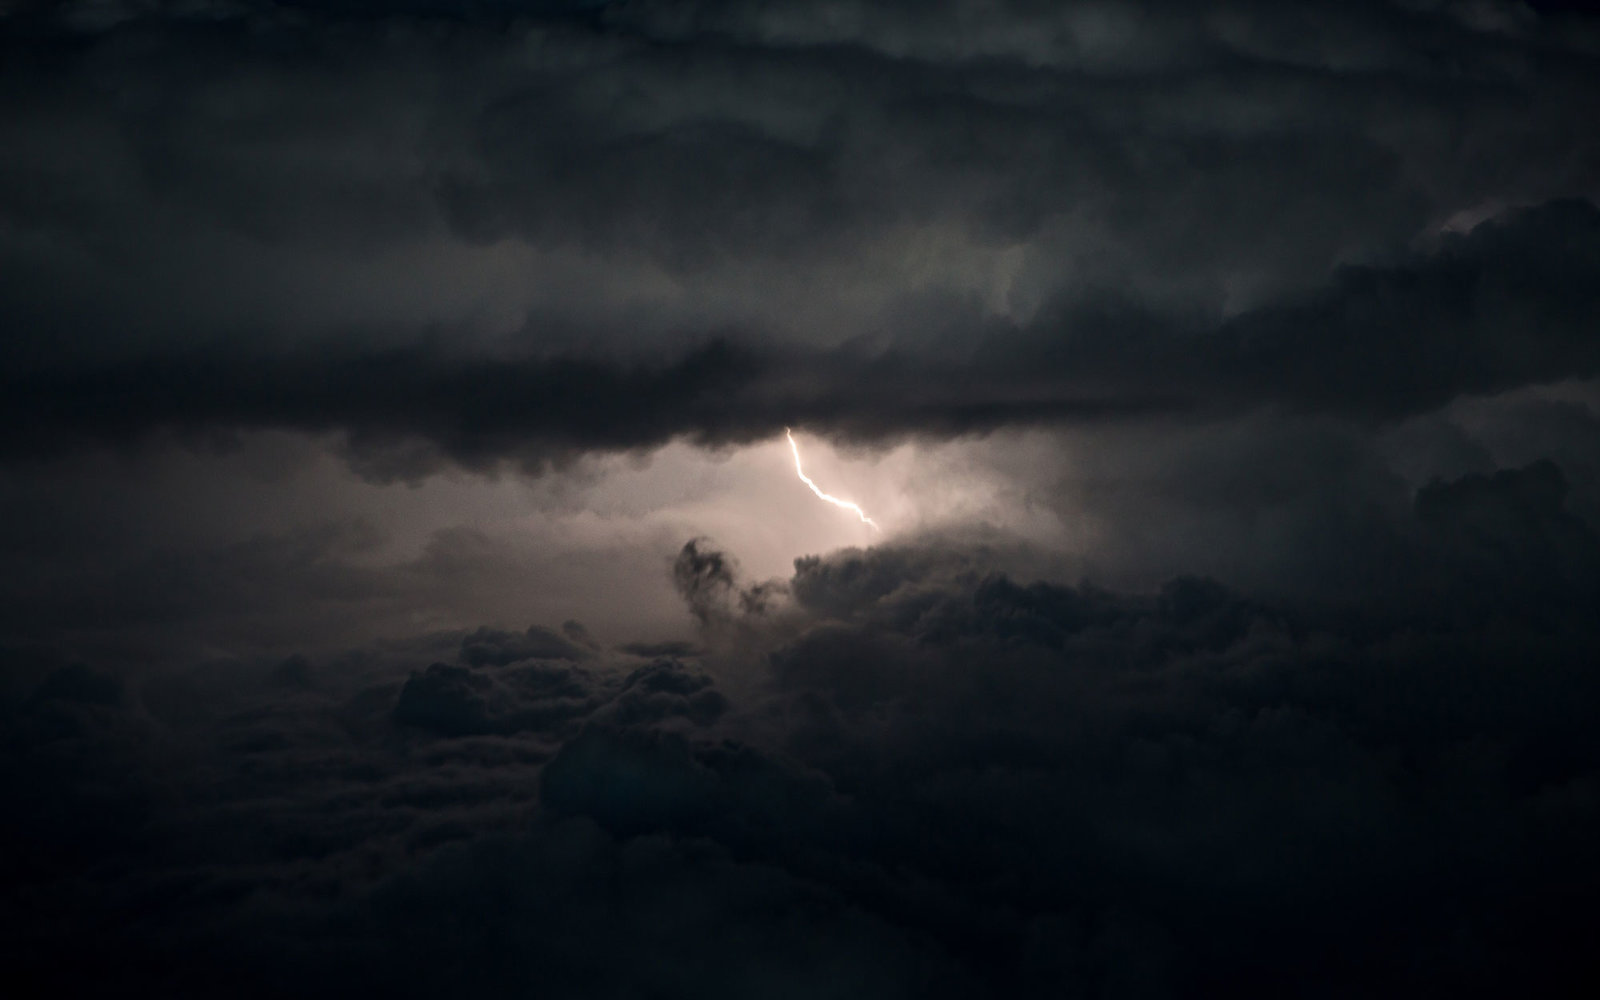 storm-lightning-PLANE0916.jpg